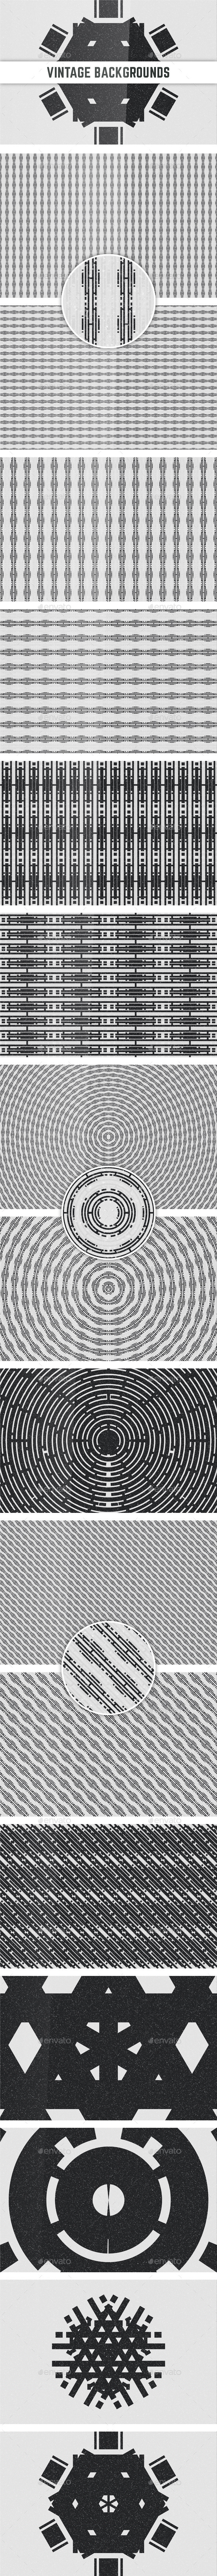 GraphicRiver Vintage Backgrounds 10784325